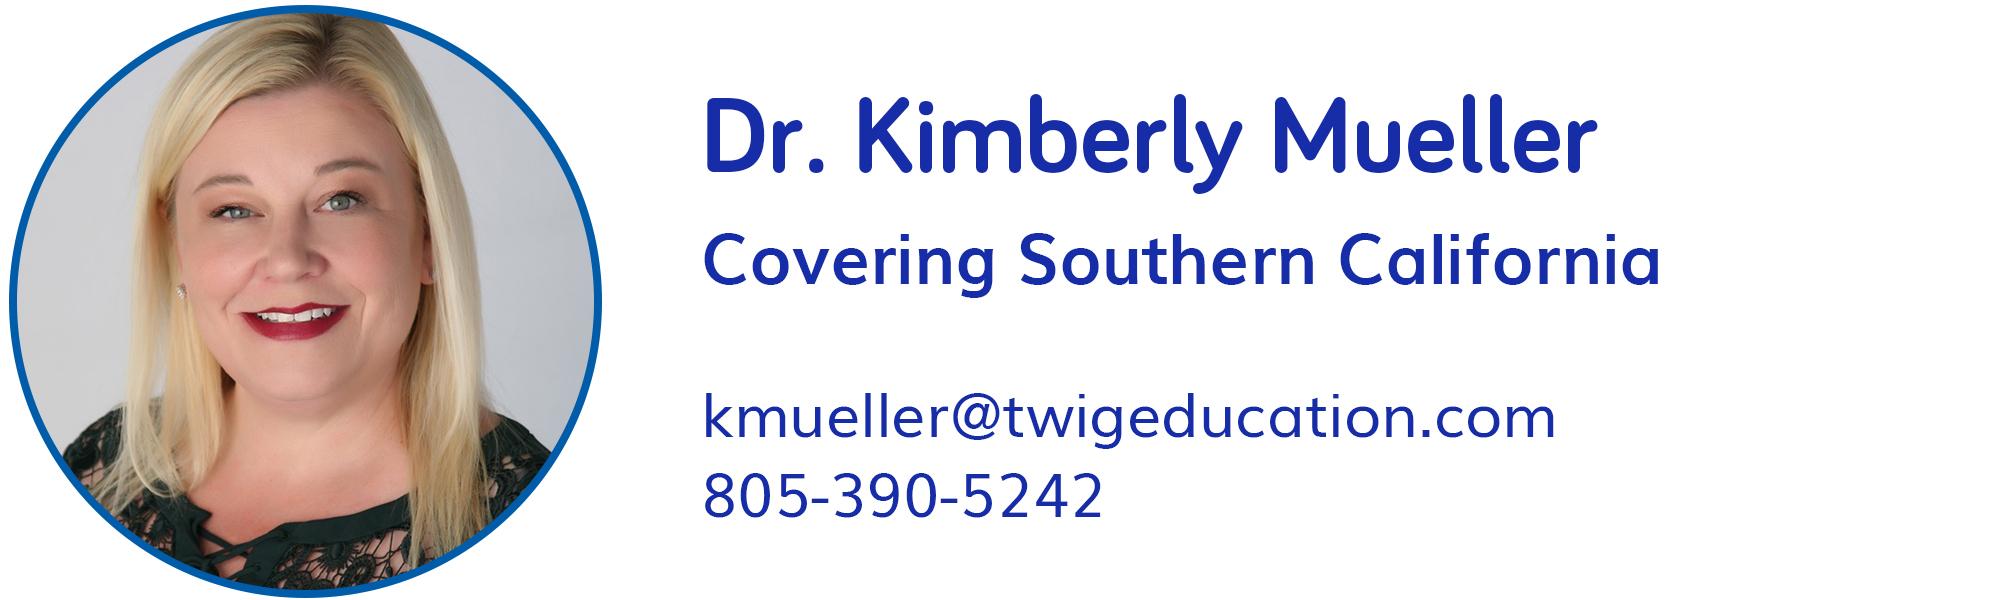 Kim Mueller, kmueller@twigeducation.com, 805-390-5242